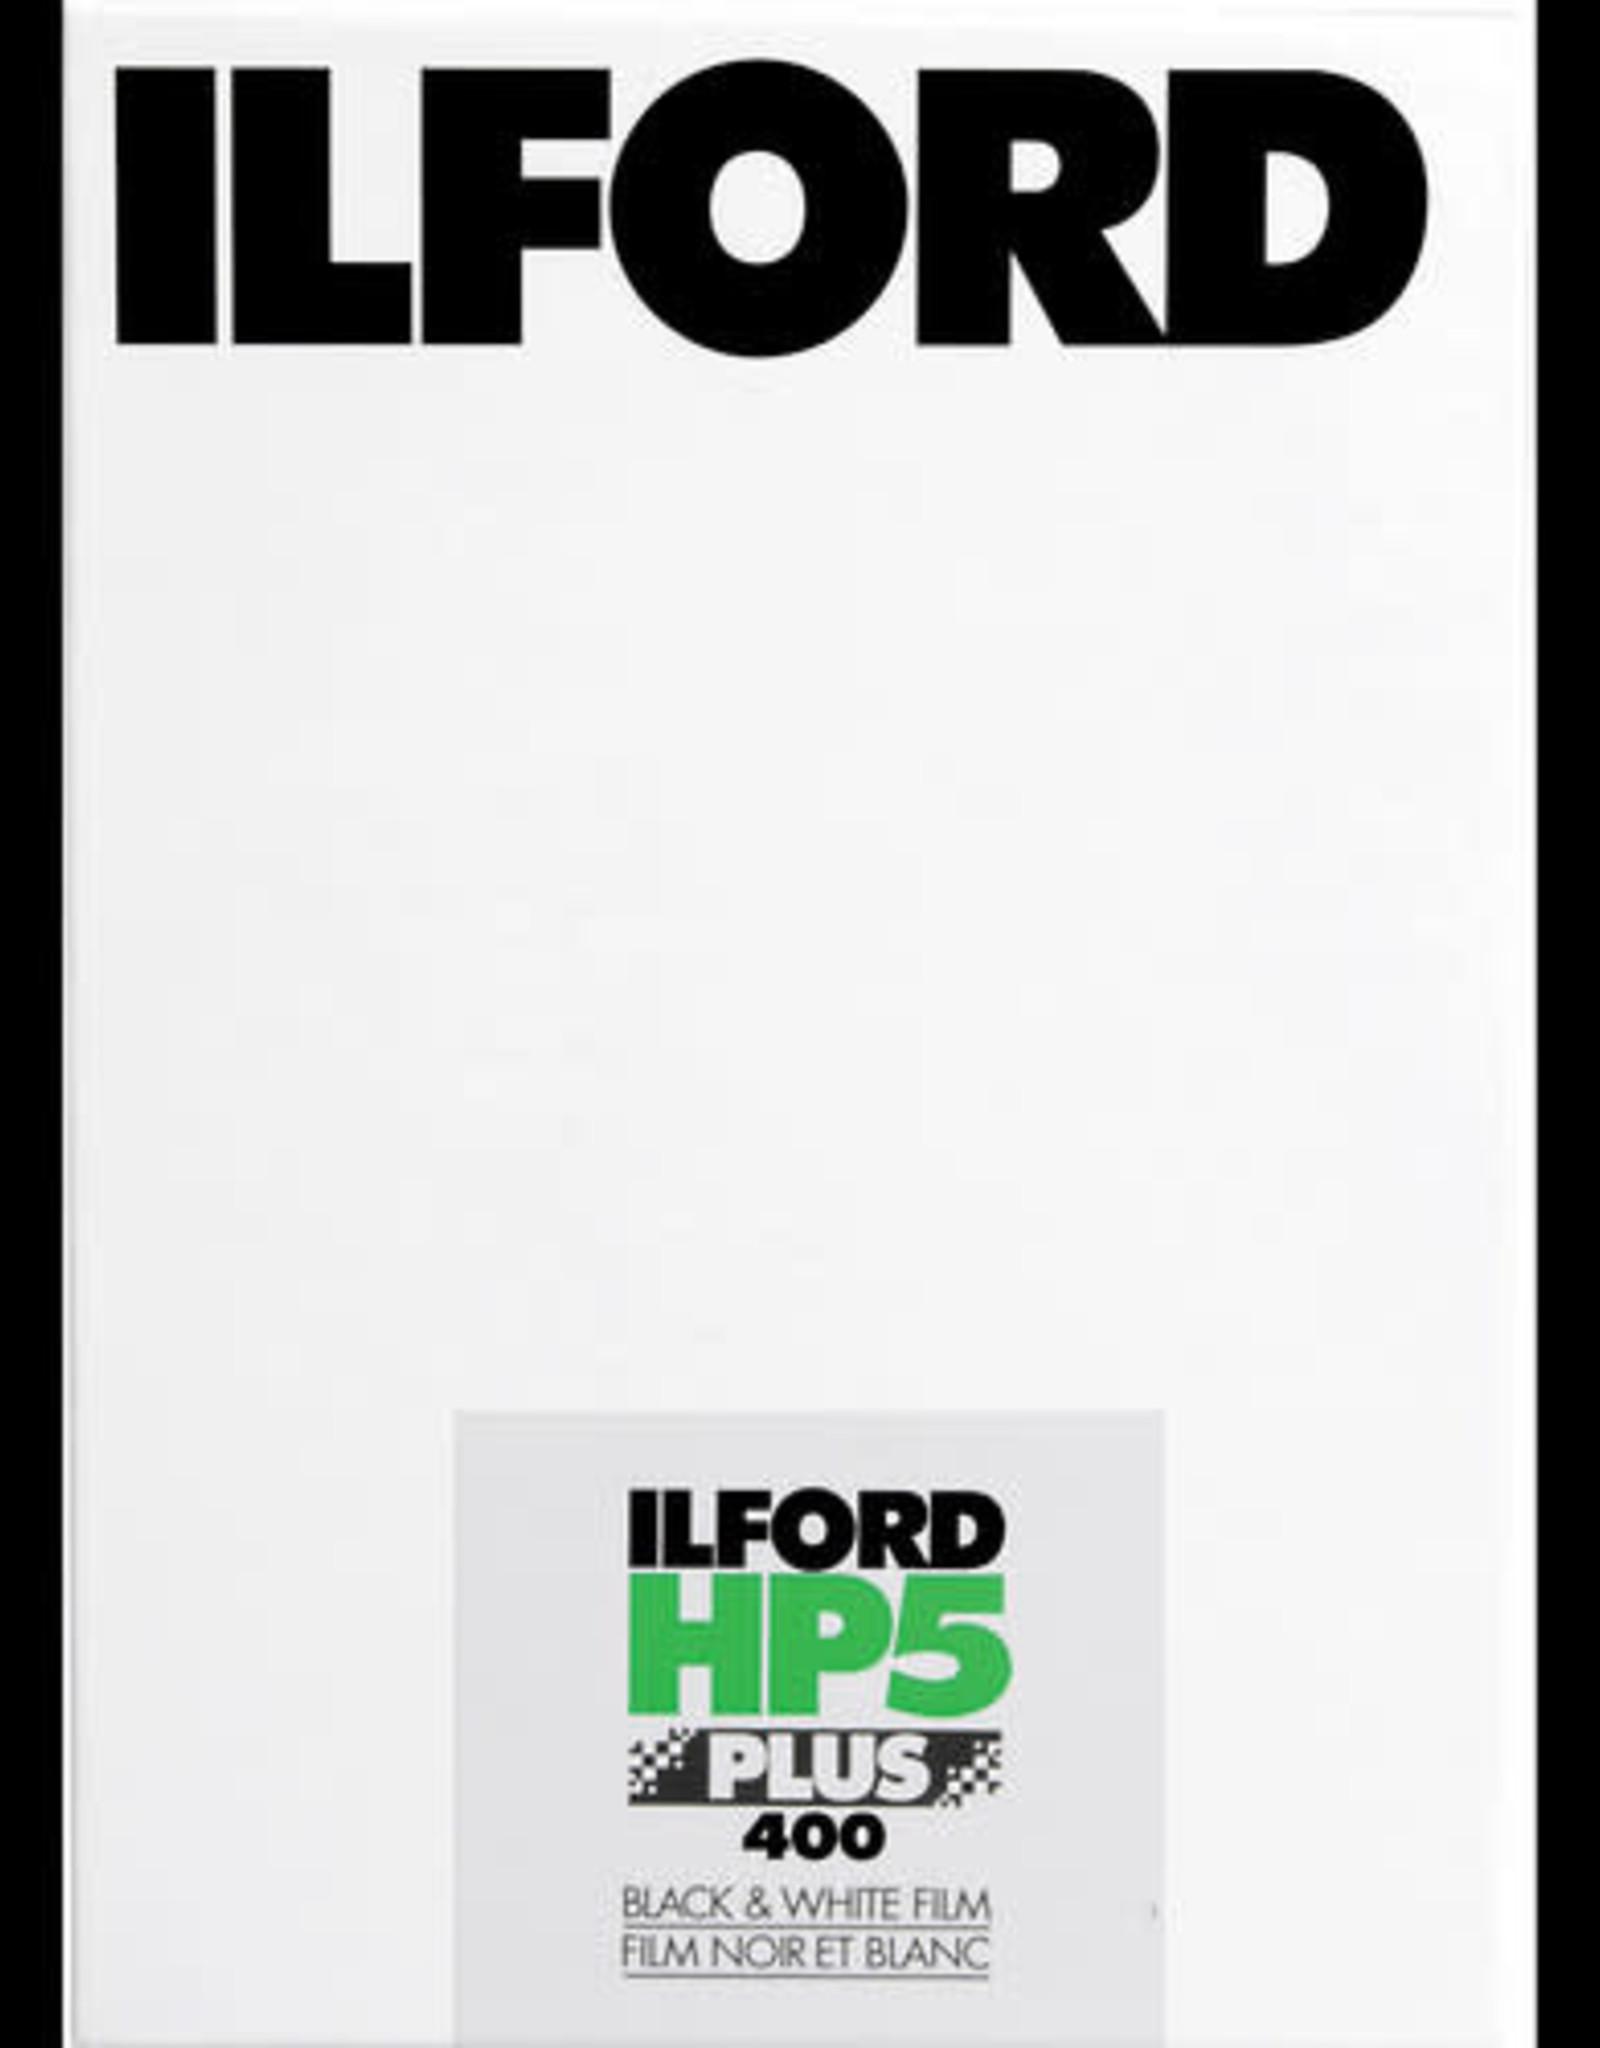 ILFORD HP5 4X5 25 SHEET